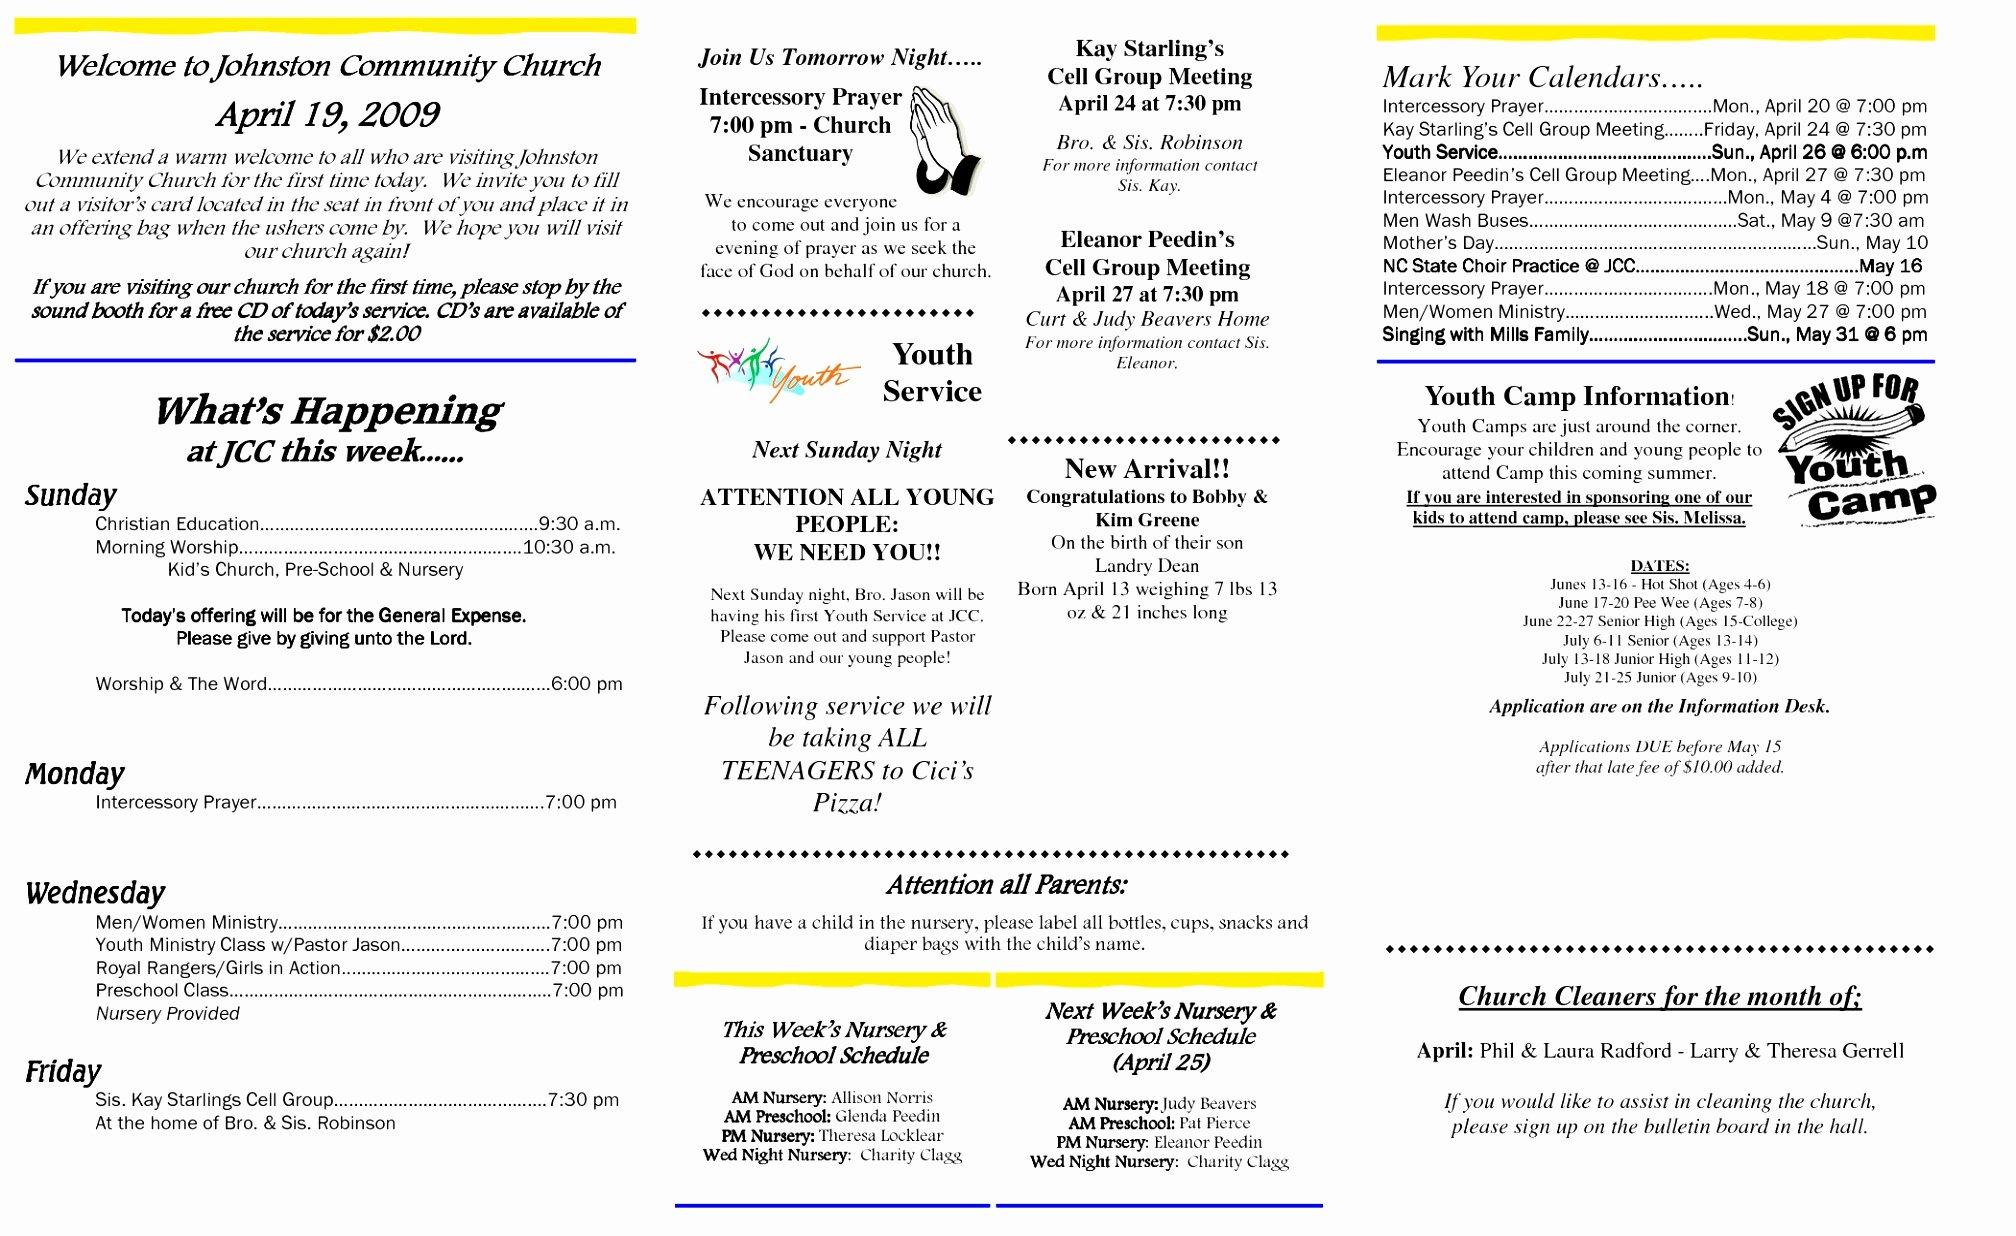 Free Bulletin Template Fresh 12 Church Bulletin Template Microsoft Word Oinwy